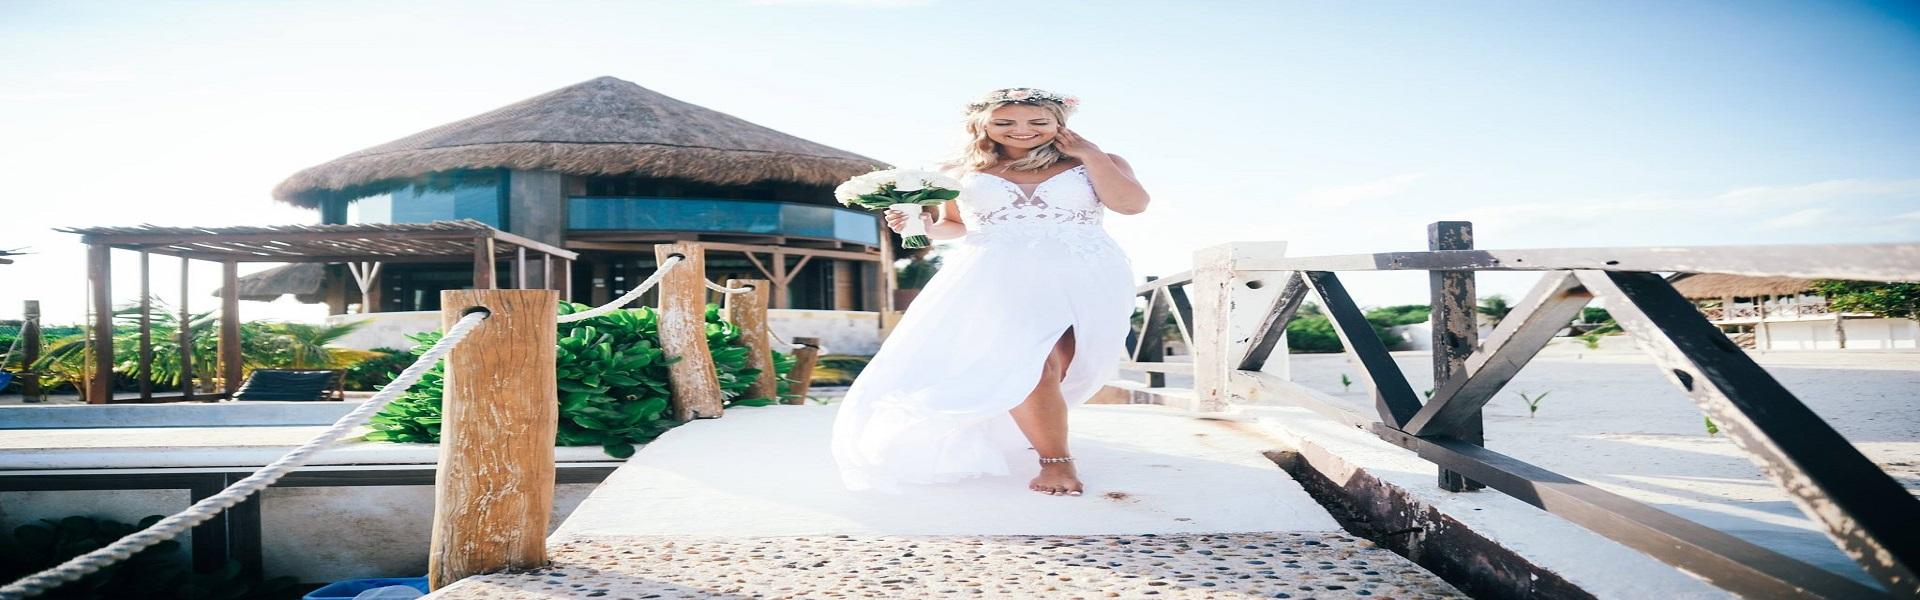 wedding beachvillasuites mexico